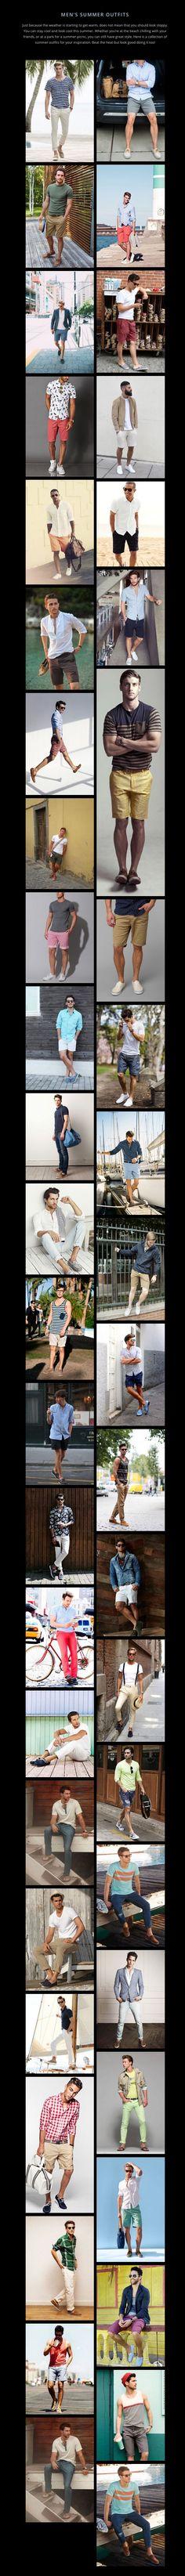 Con estos outfits seguro que tu hombre se inspirará para lucir look en verano :)